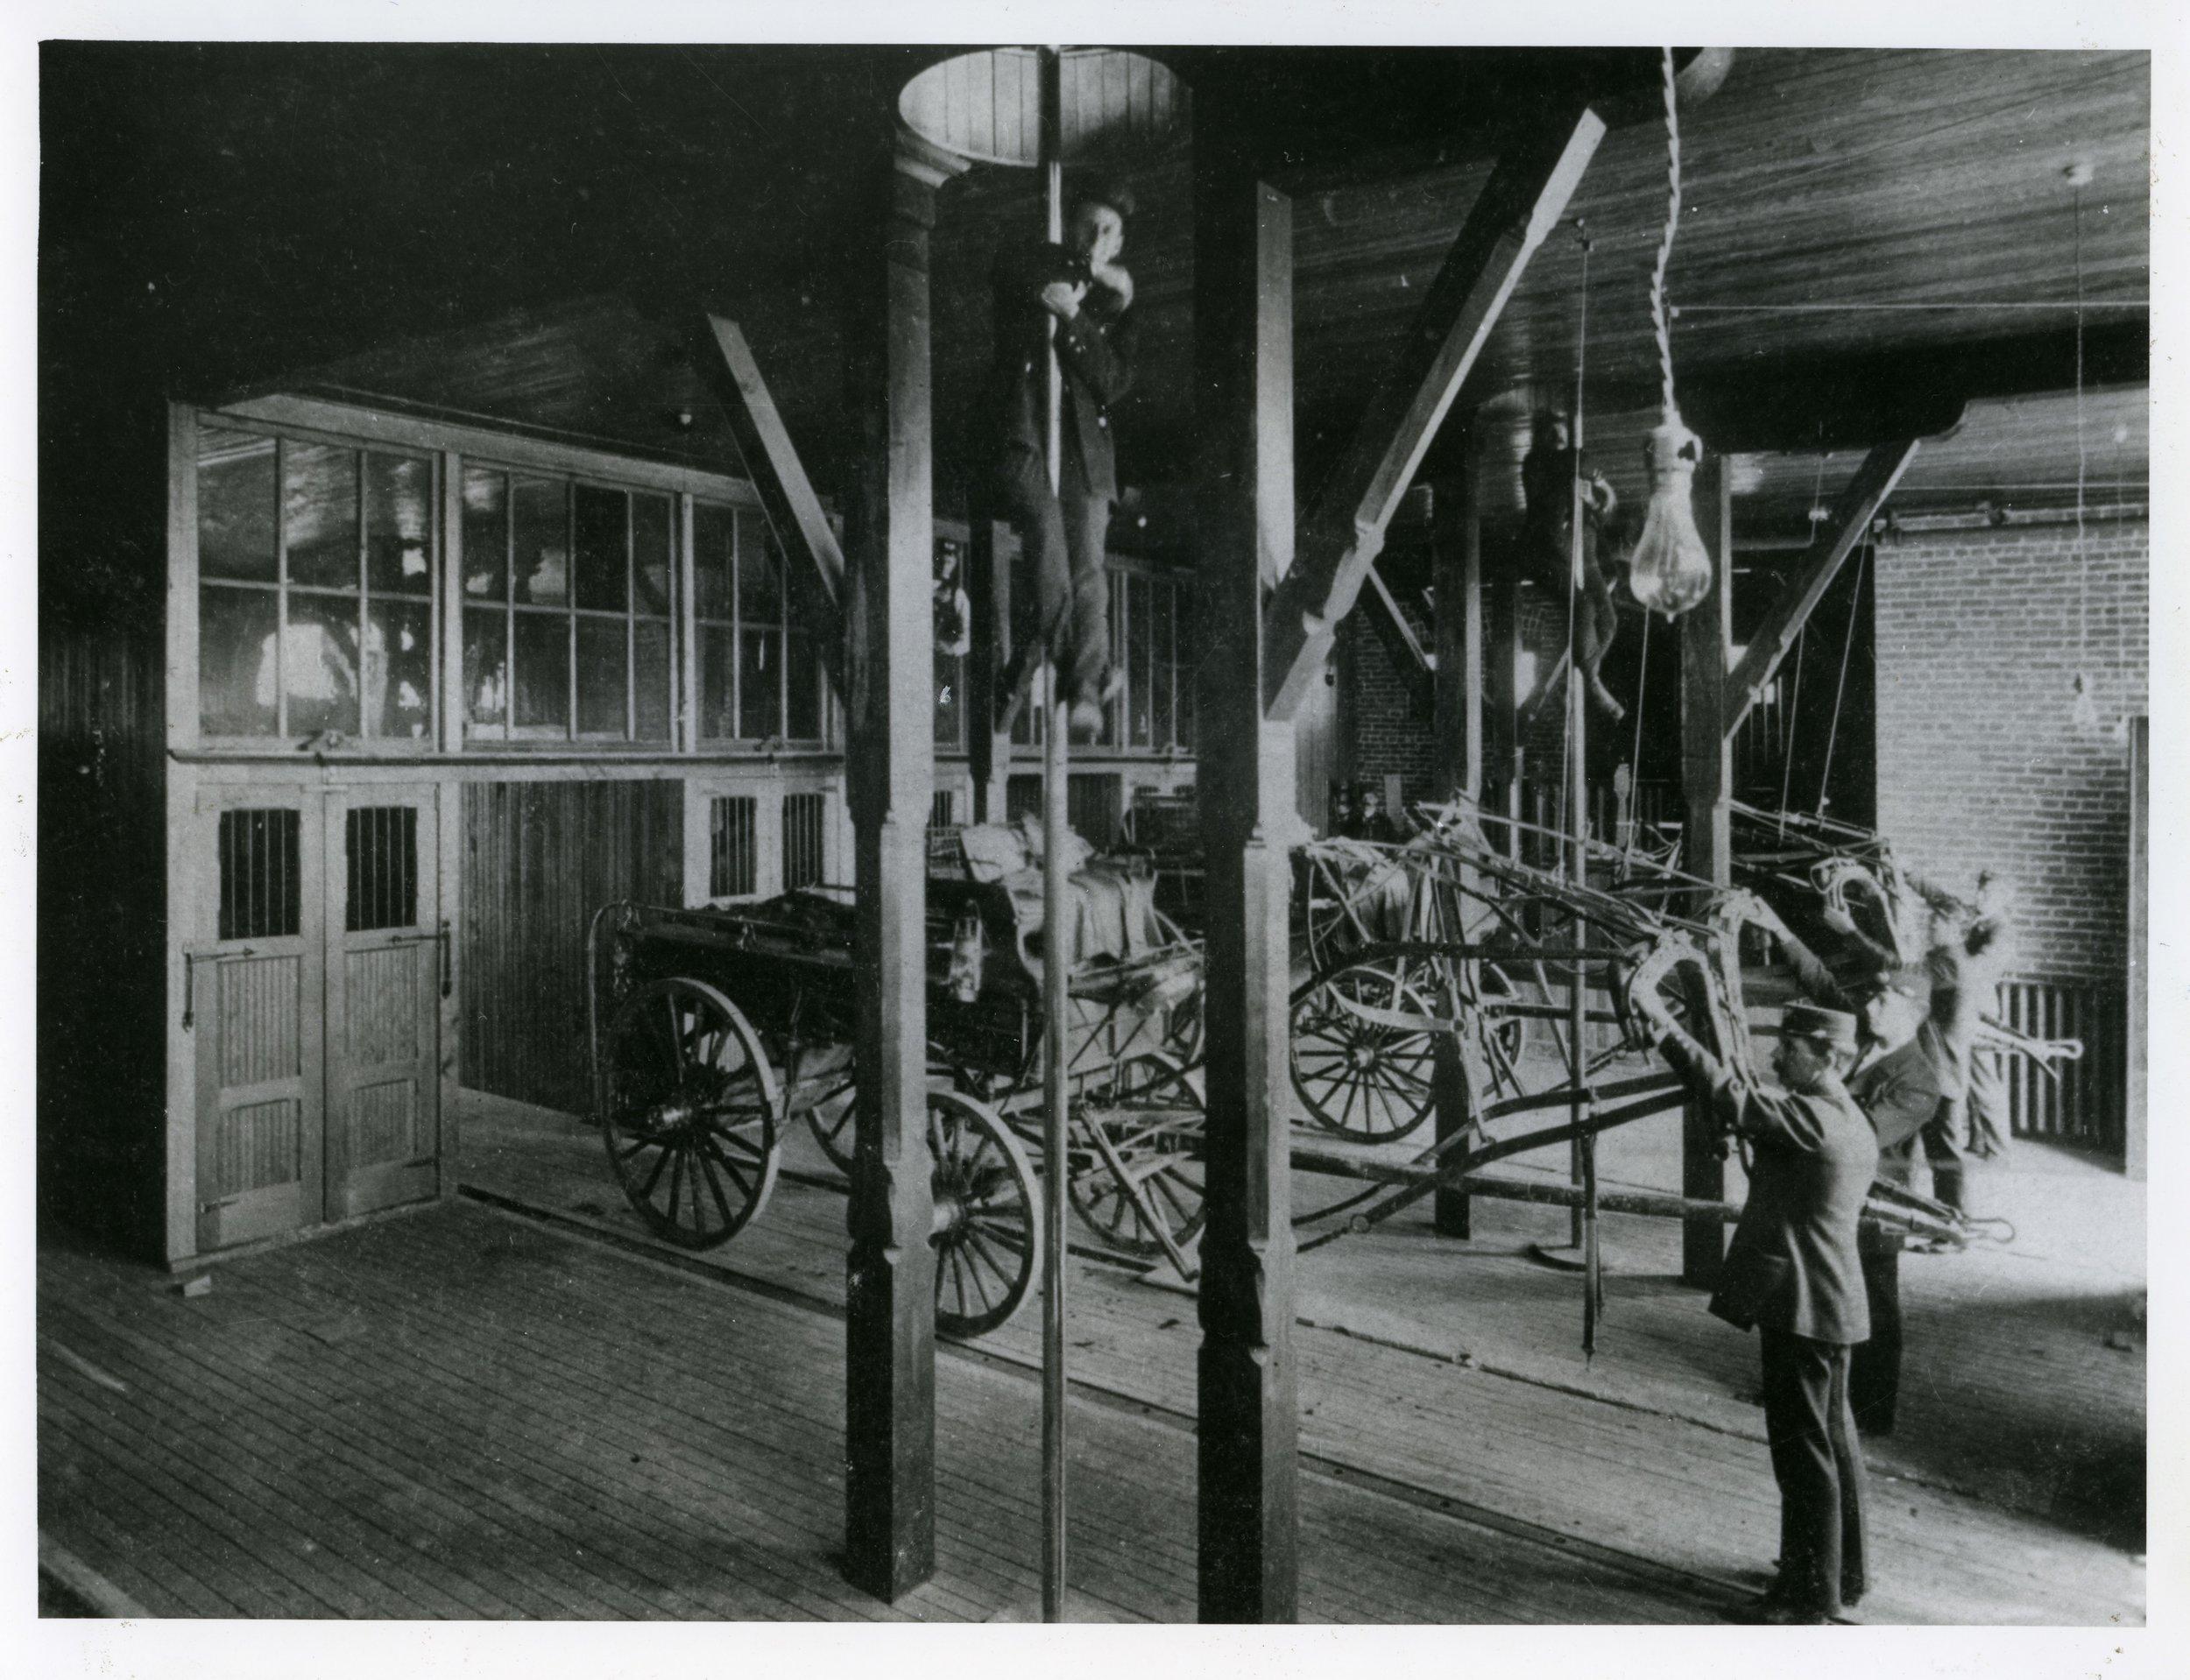 Photo 2276.0031: The interior of the Rossland Fire Hall, circa 1901.